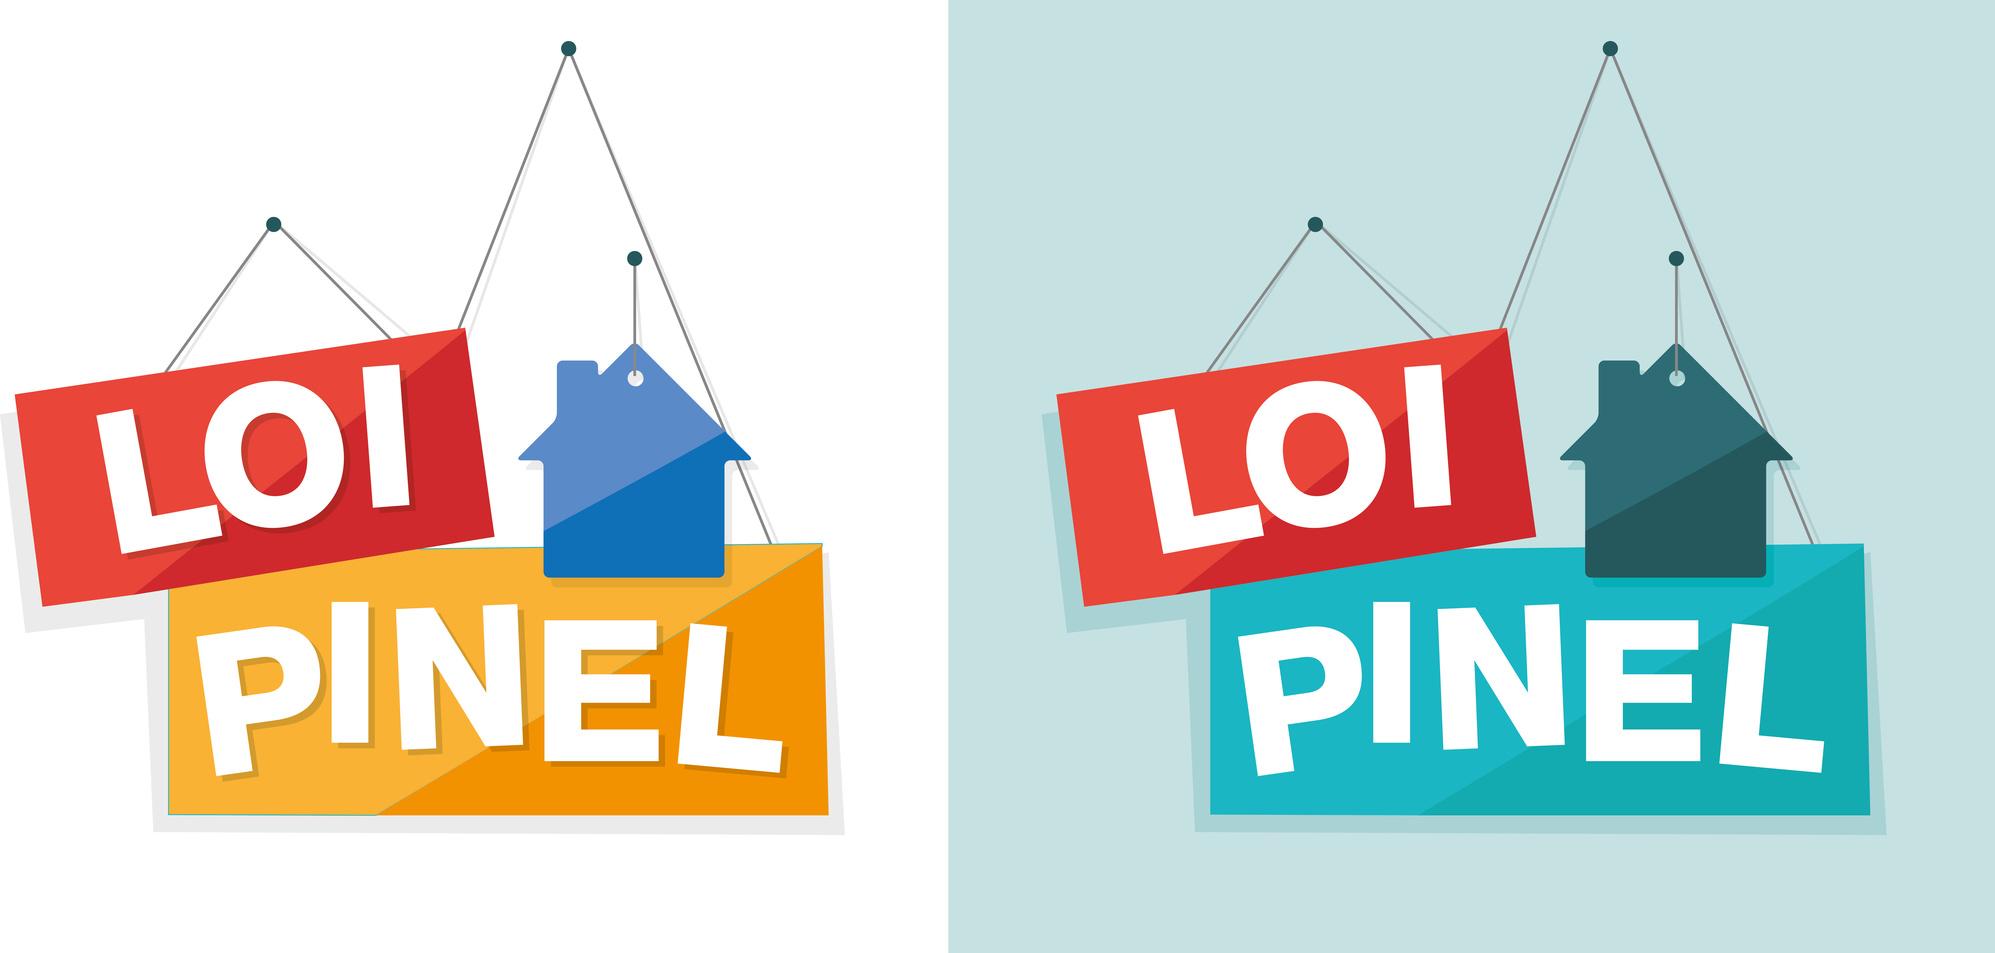 Bilan 2015 des investissements en loi Pinel